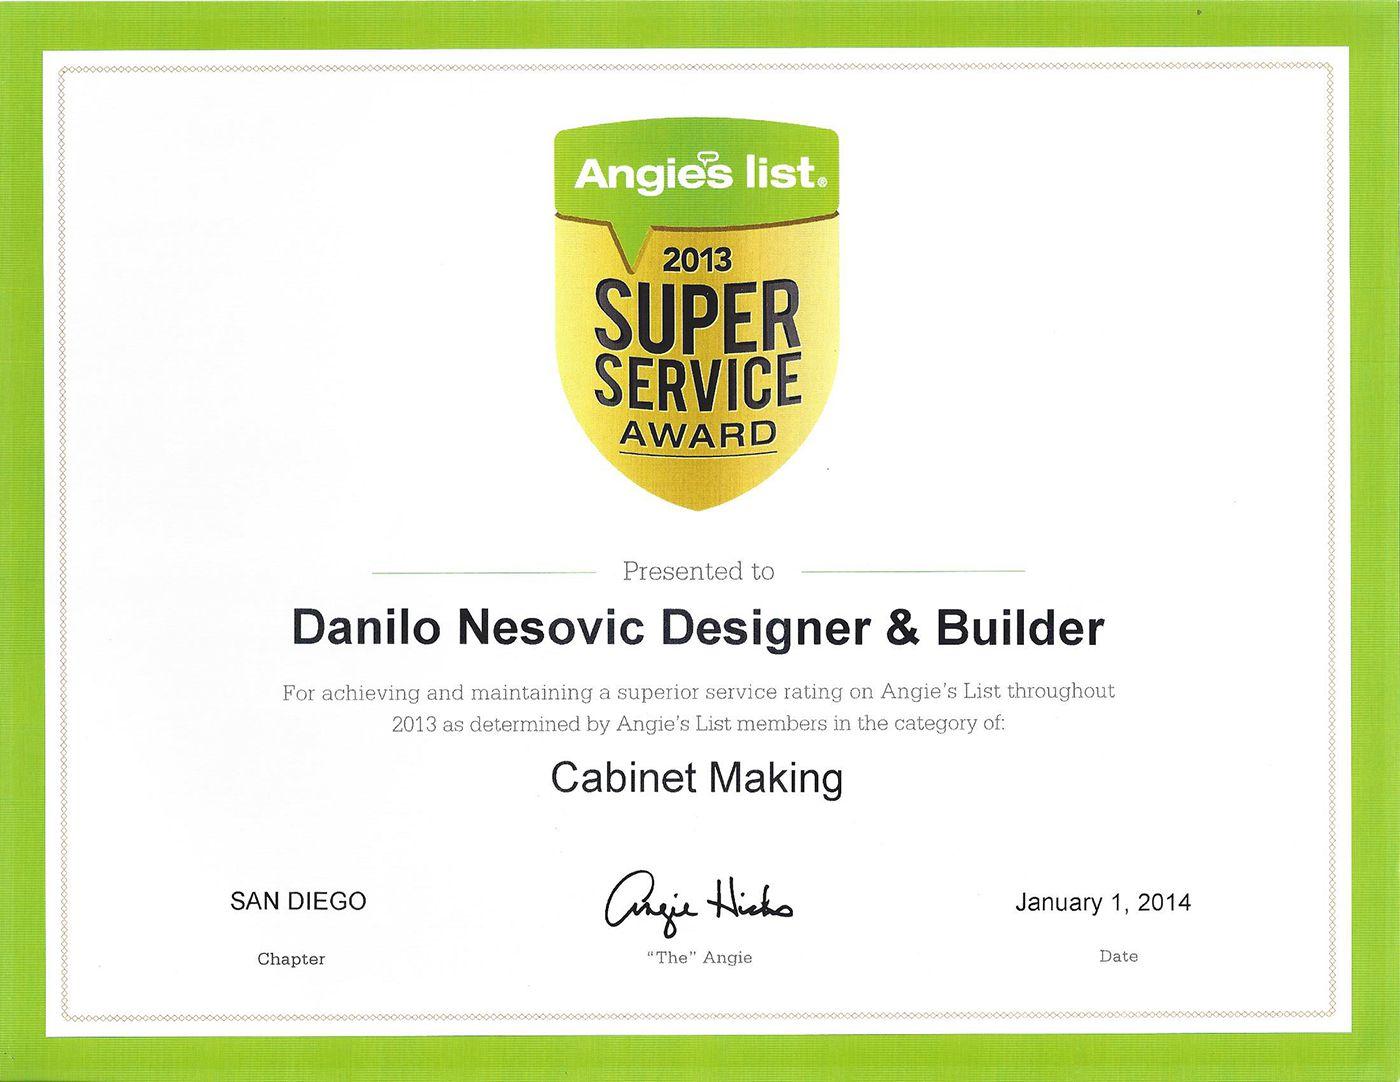 Awards danilo nesovic designer builder kitchen - Angie s list bathroom remodeling ...